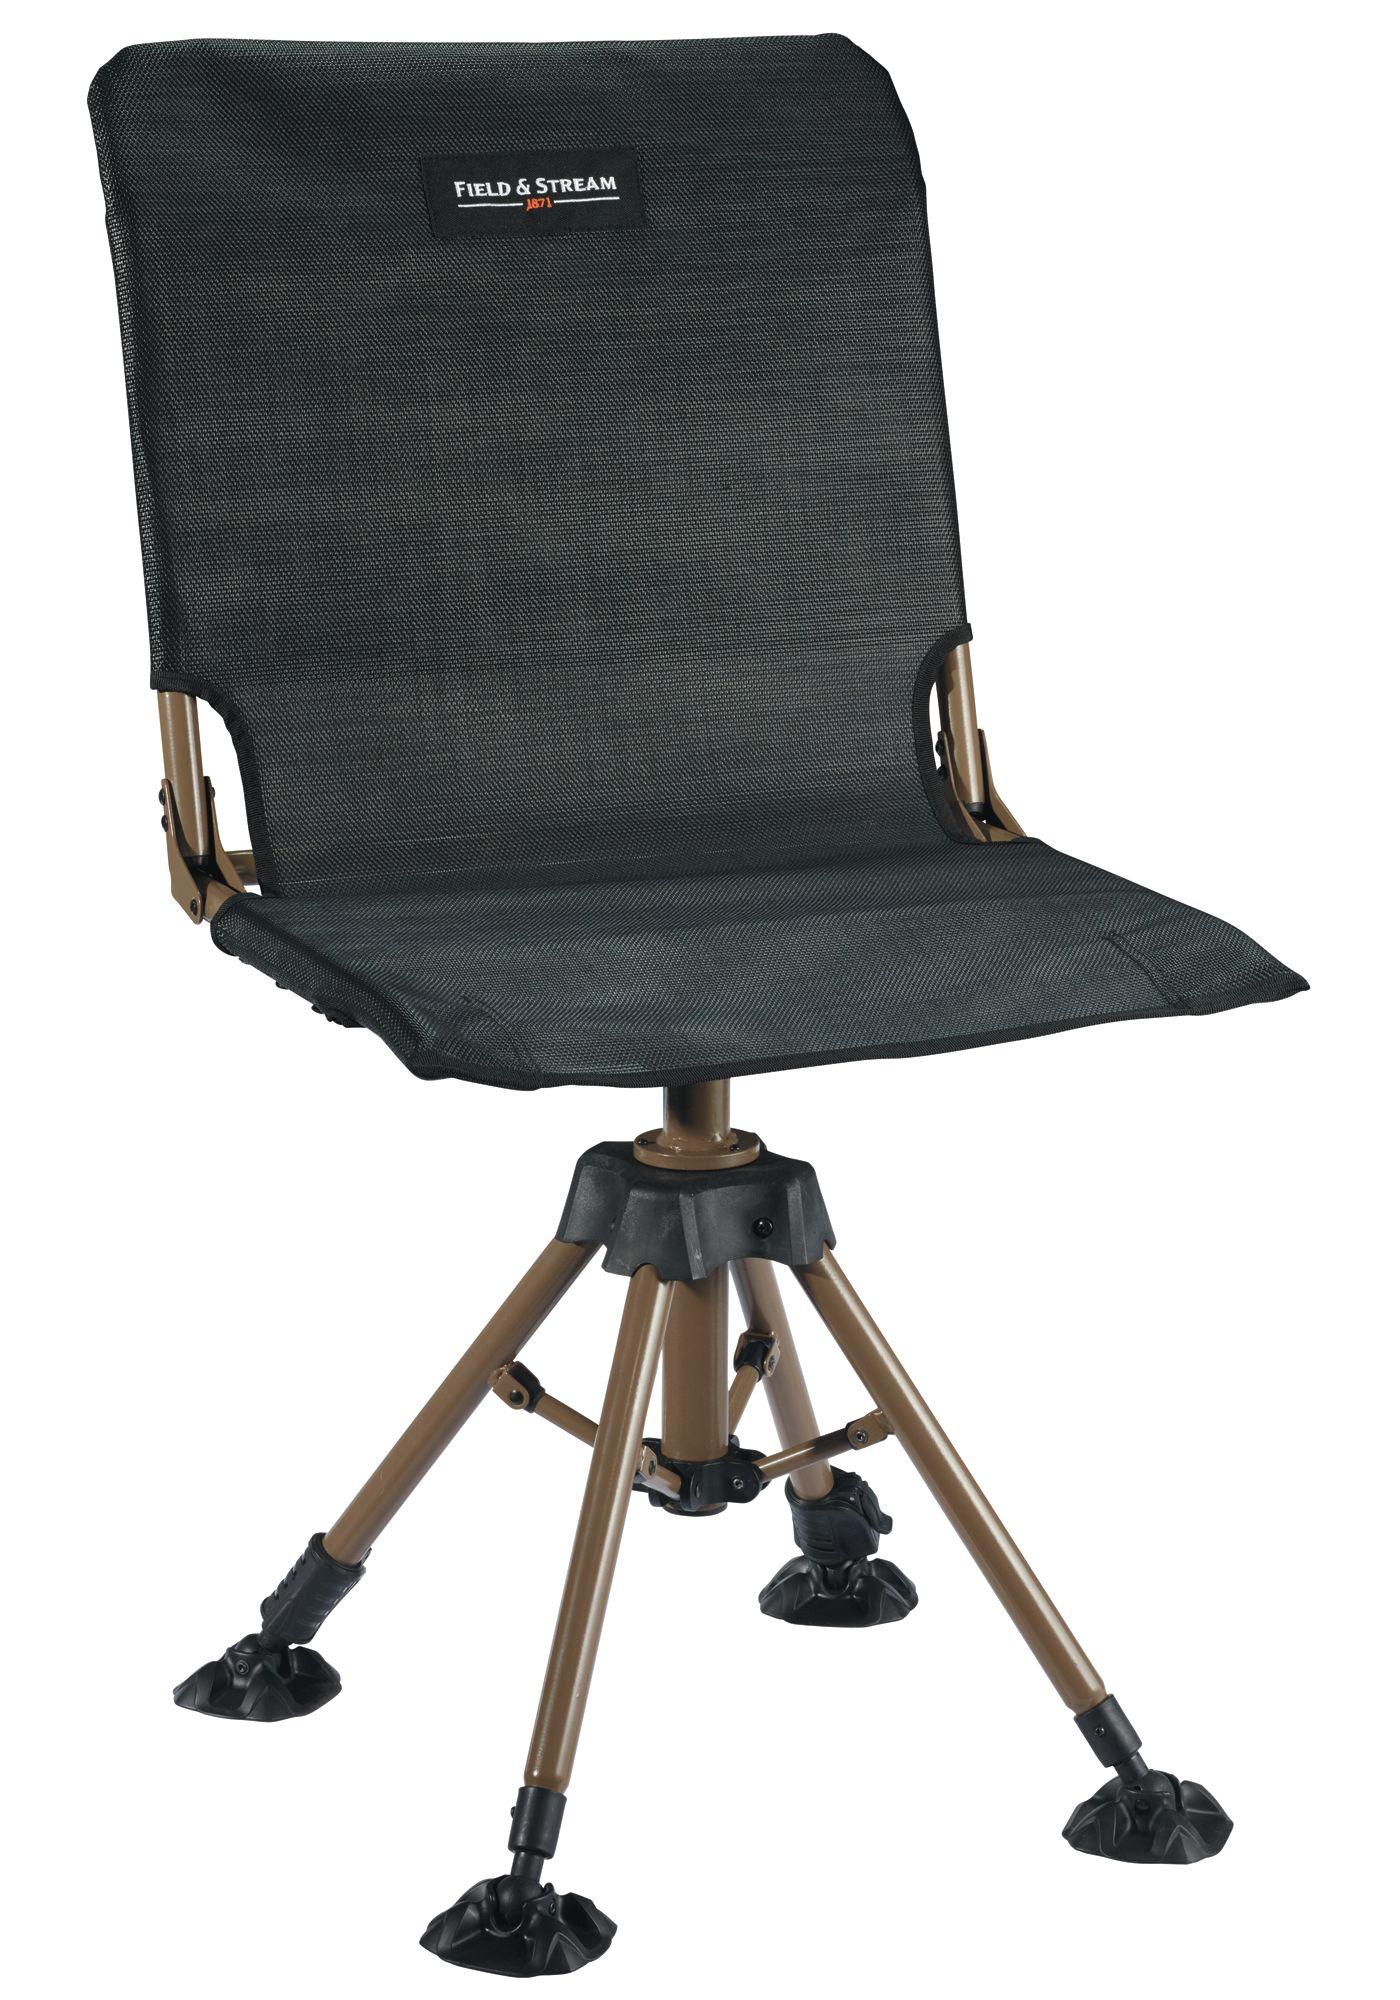 Field & Stream Rotating Blind Chair